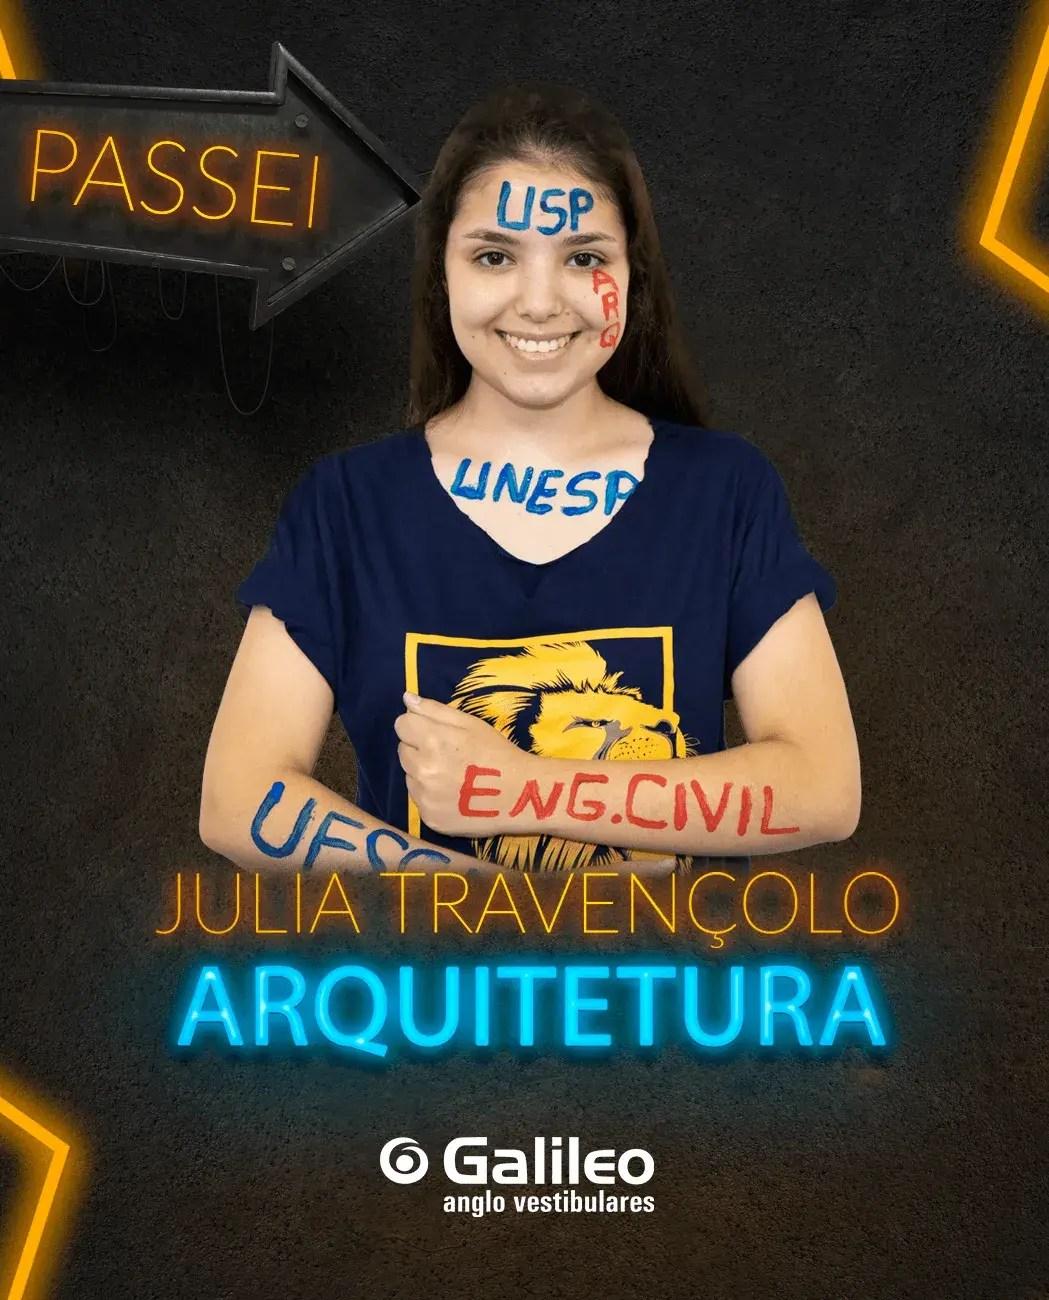 01 - Julia Travençolo - Arquitetura-min